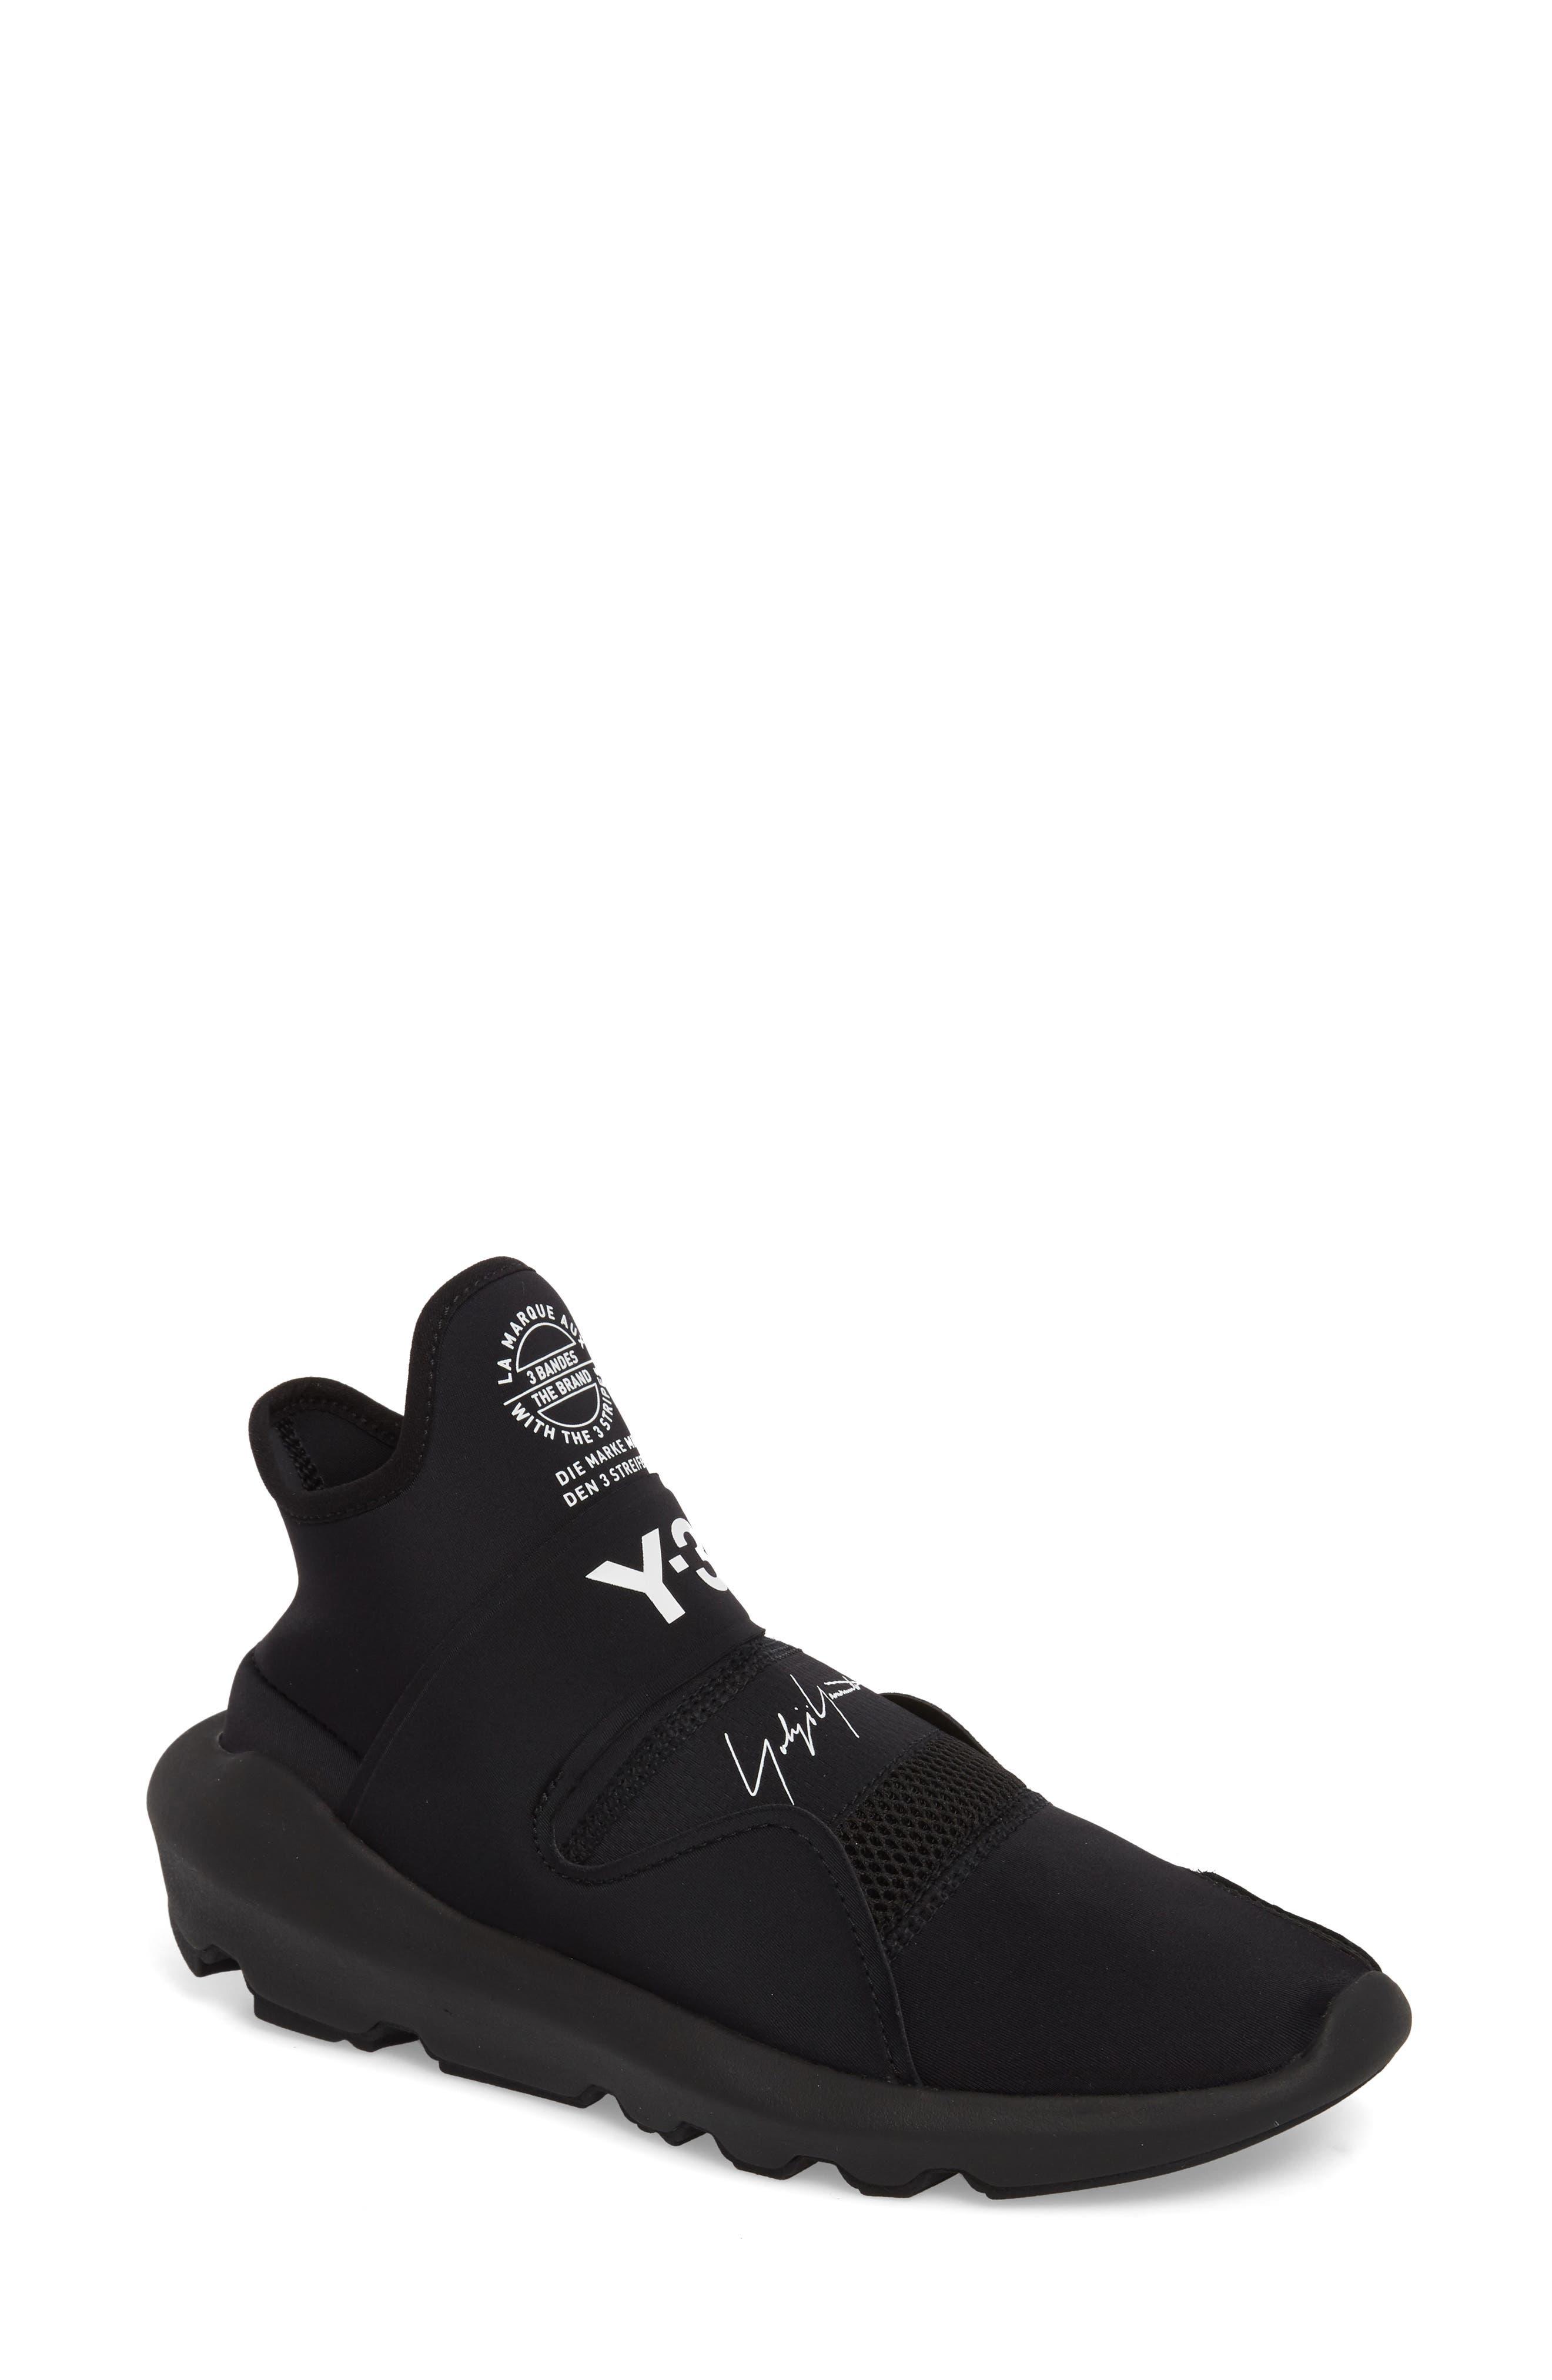 Superbou Sneaker,                             Main thumbnail 1, color,                             Black / Core White